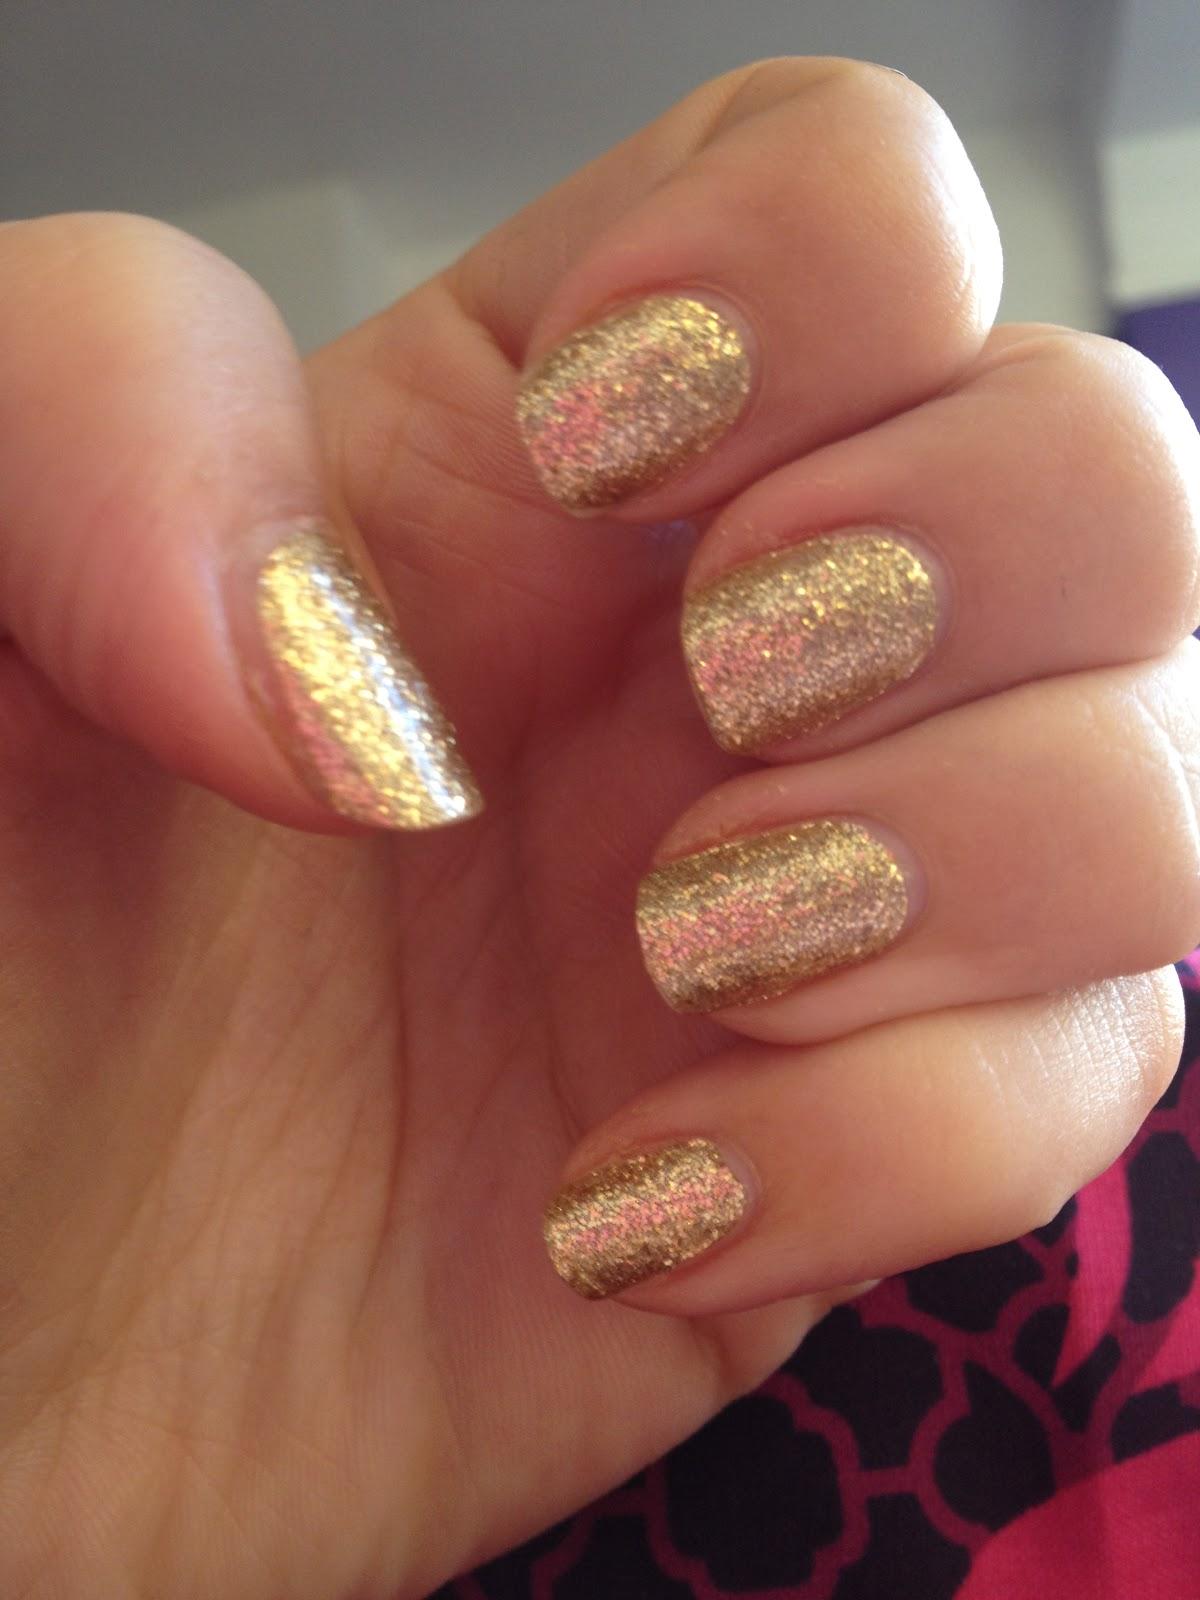 Sally Hansen Gold Glitter Nail Wraps